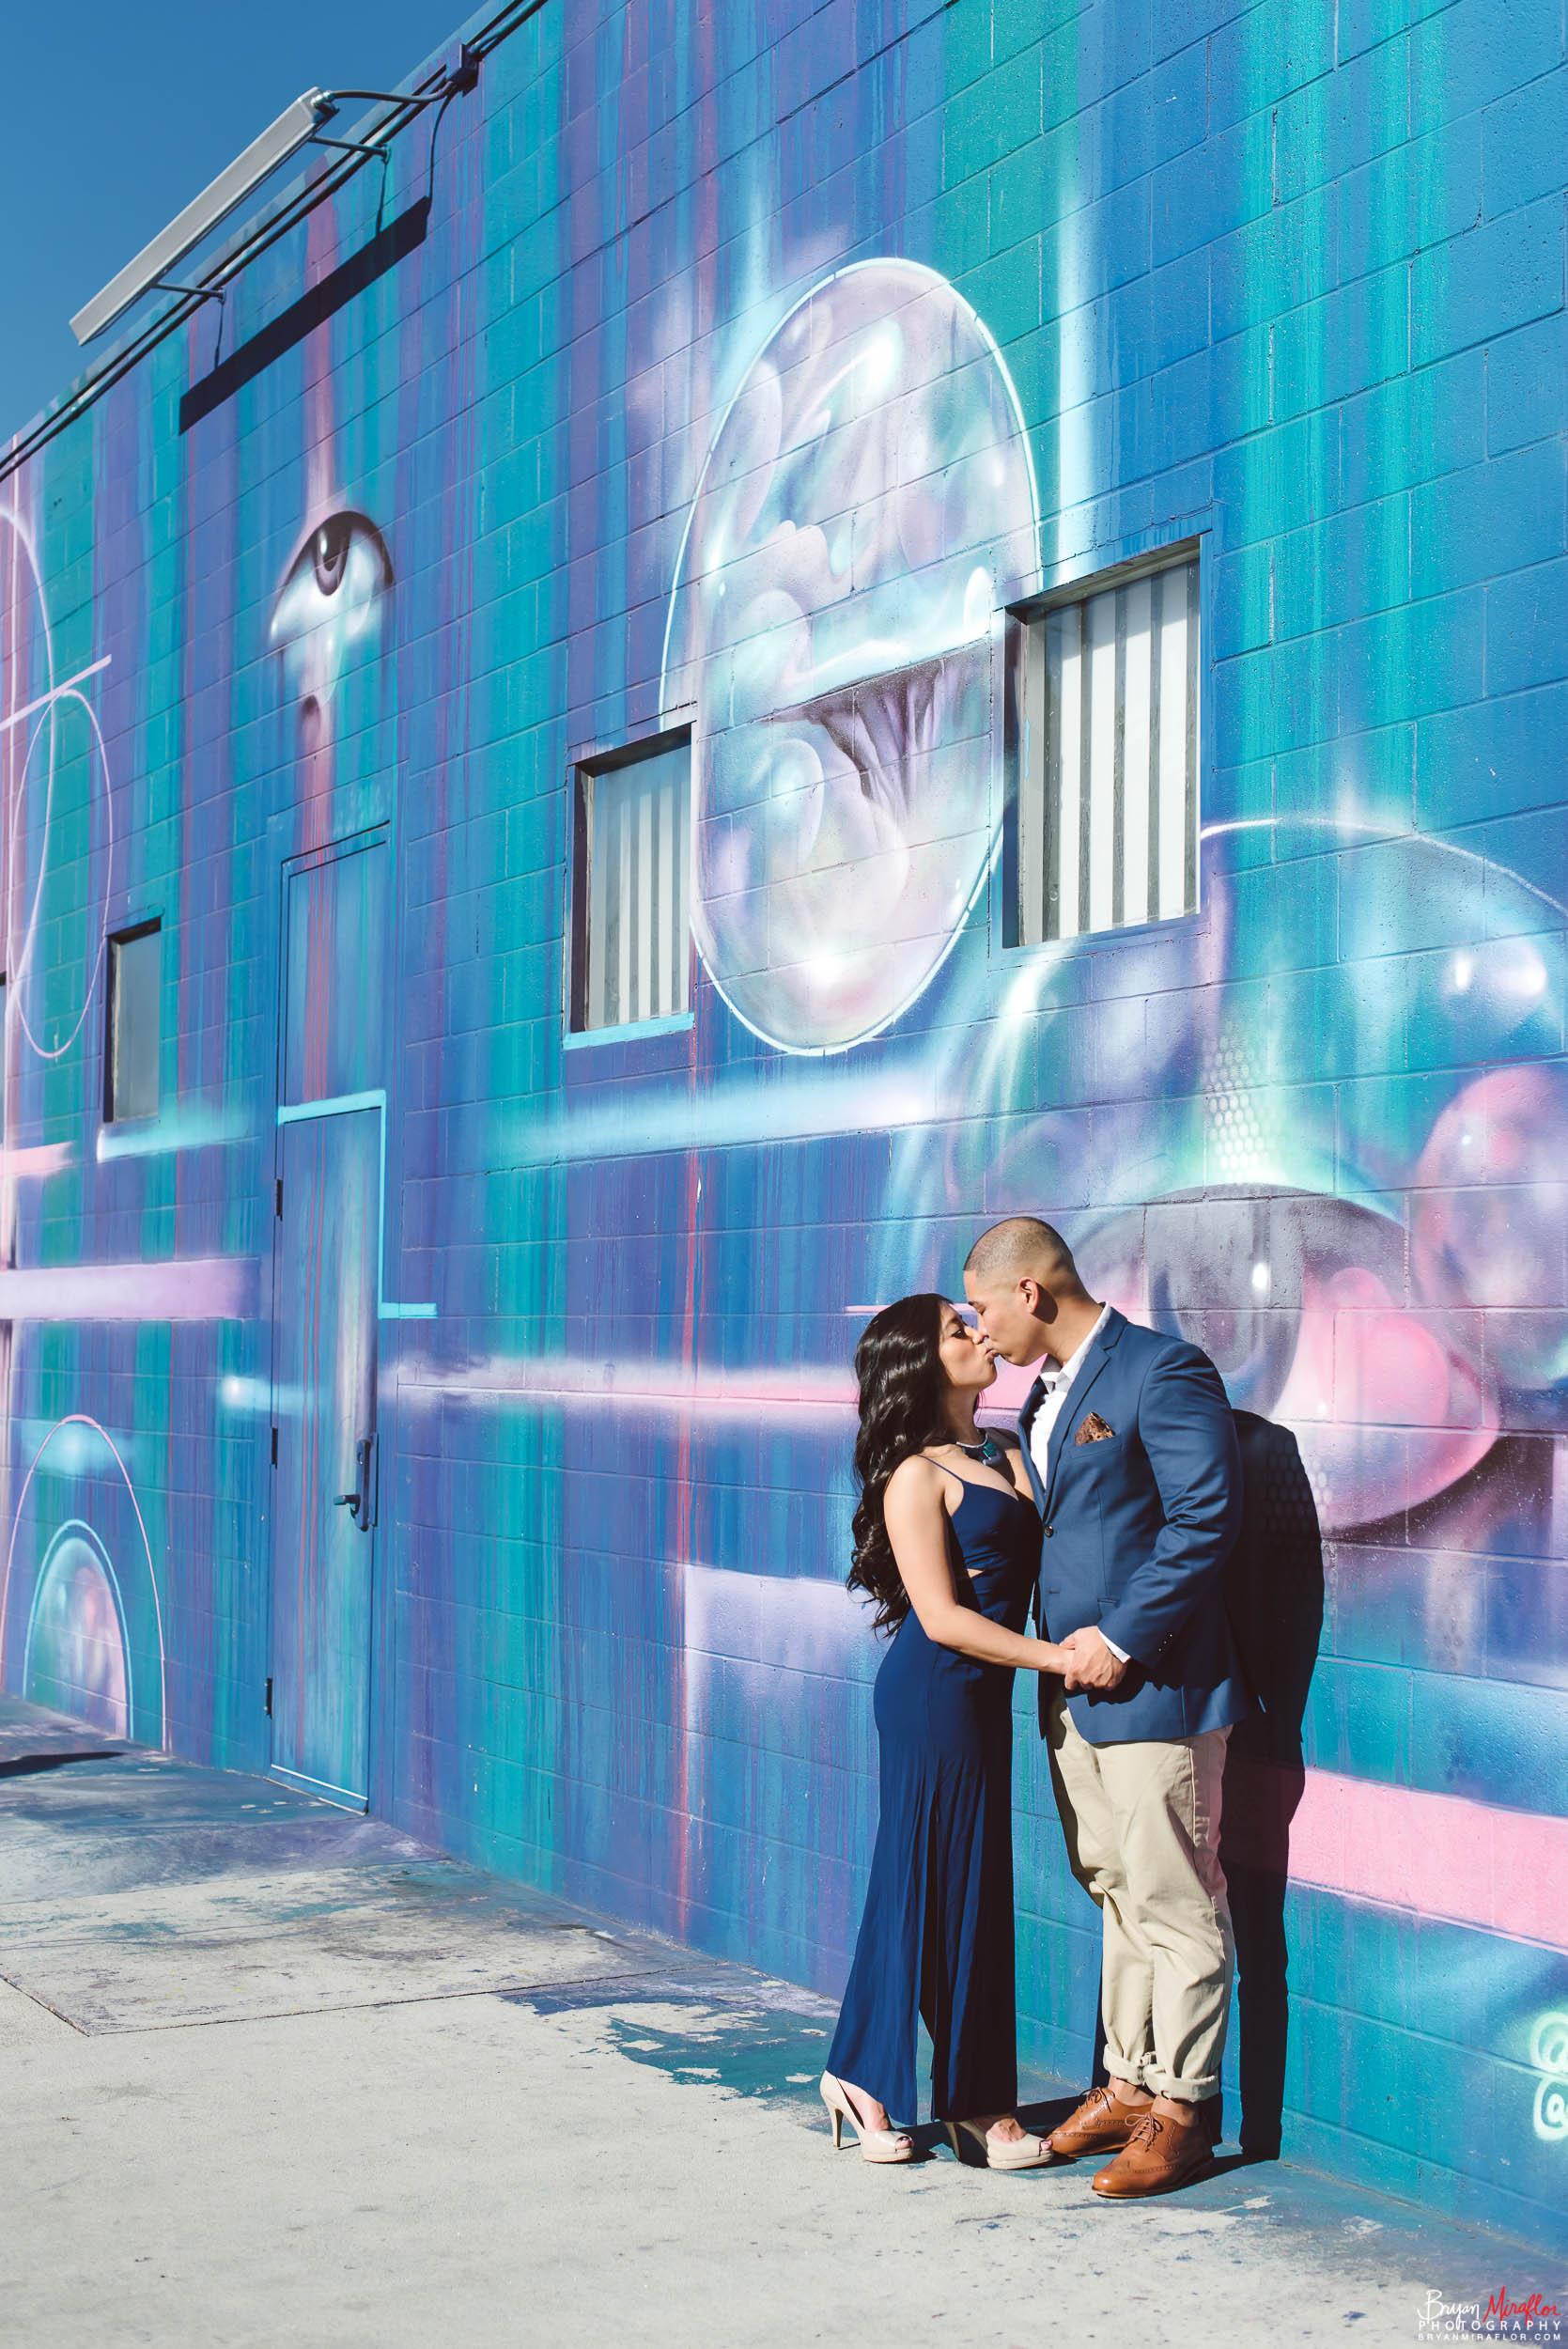 Bryan-Miraflor-Photography-Trisha-Dexter-Lopez-Engagement-Formal-DTLA-Arts-20170129-0118.jpg